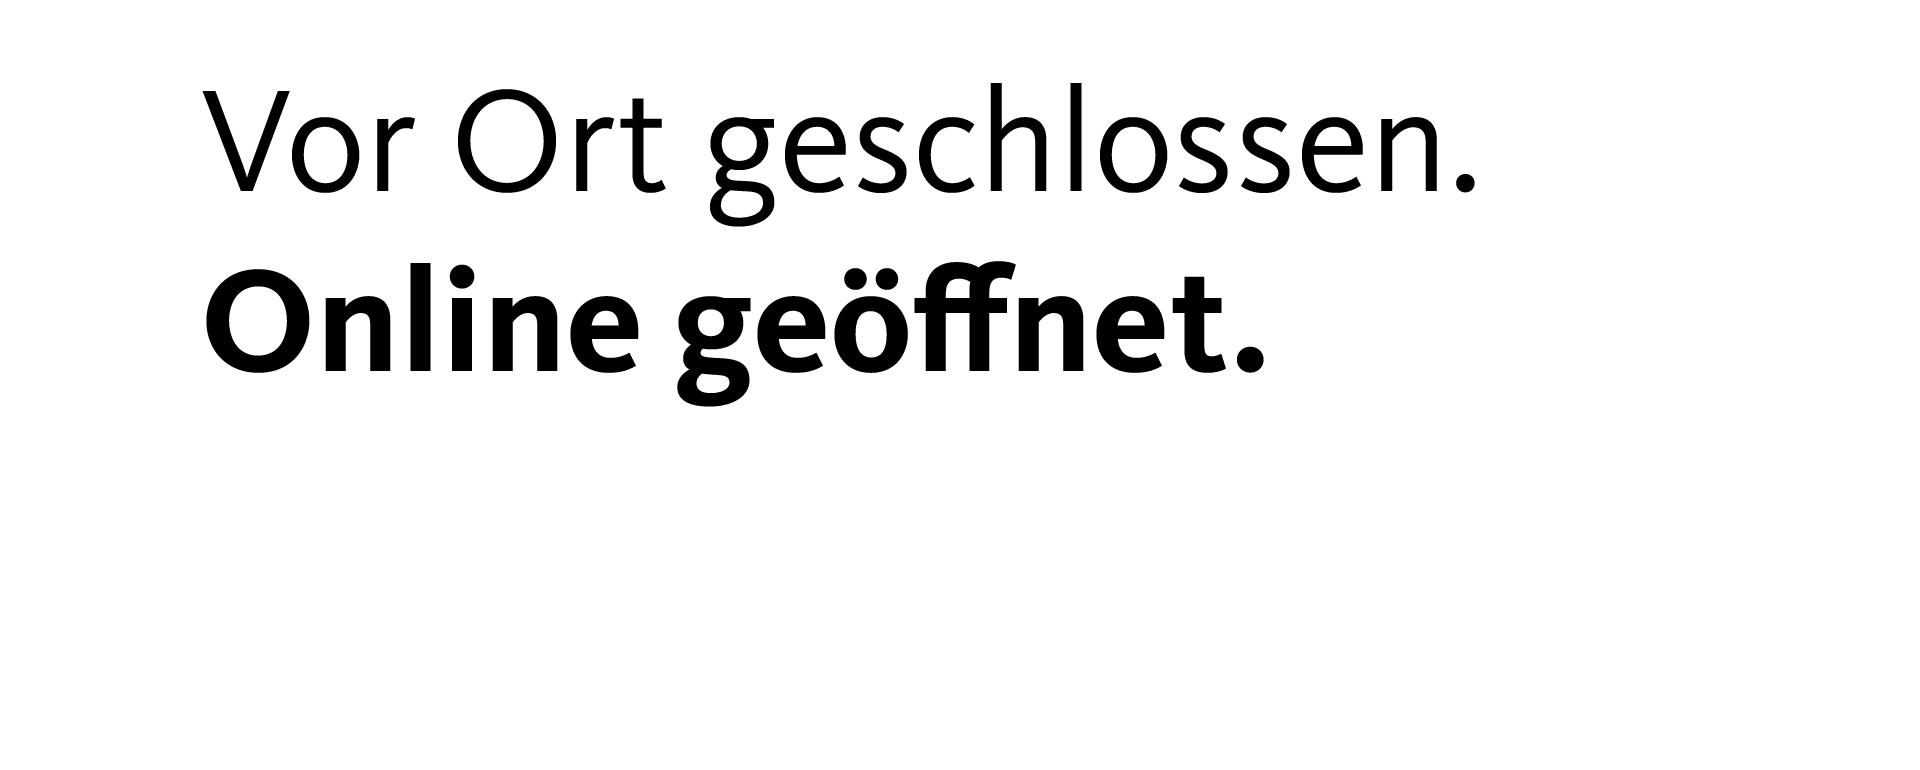 Kulturkirche Ost Köln Online geöffnet Corona Covid